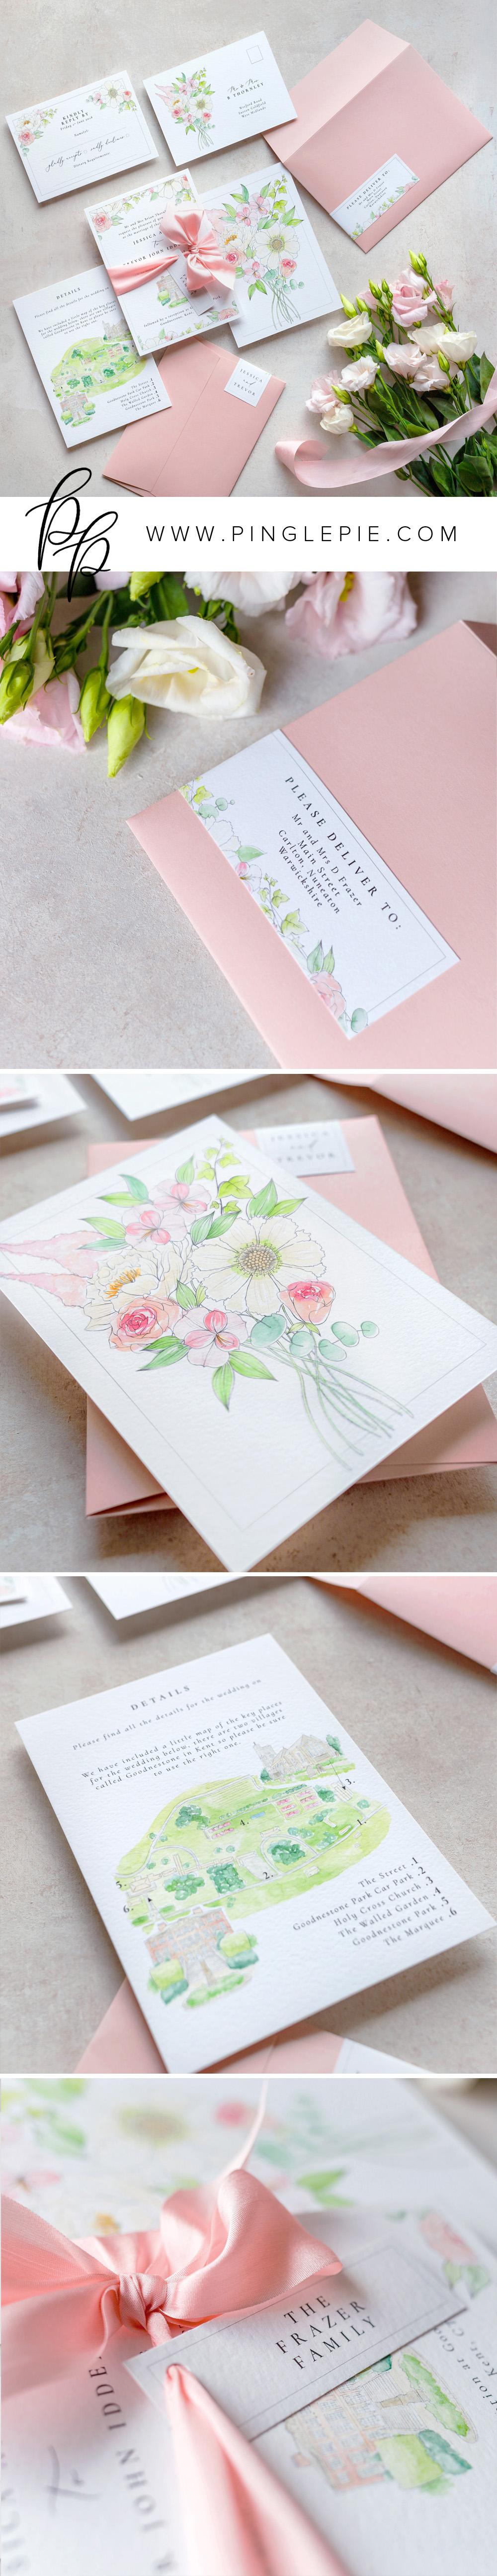 Wedding Invitations - Custom Design - Blush Pink Bouquet - Pingle Pie